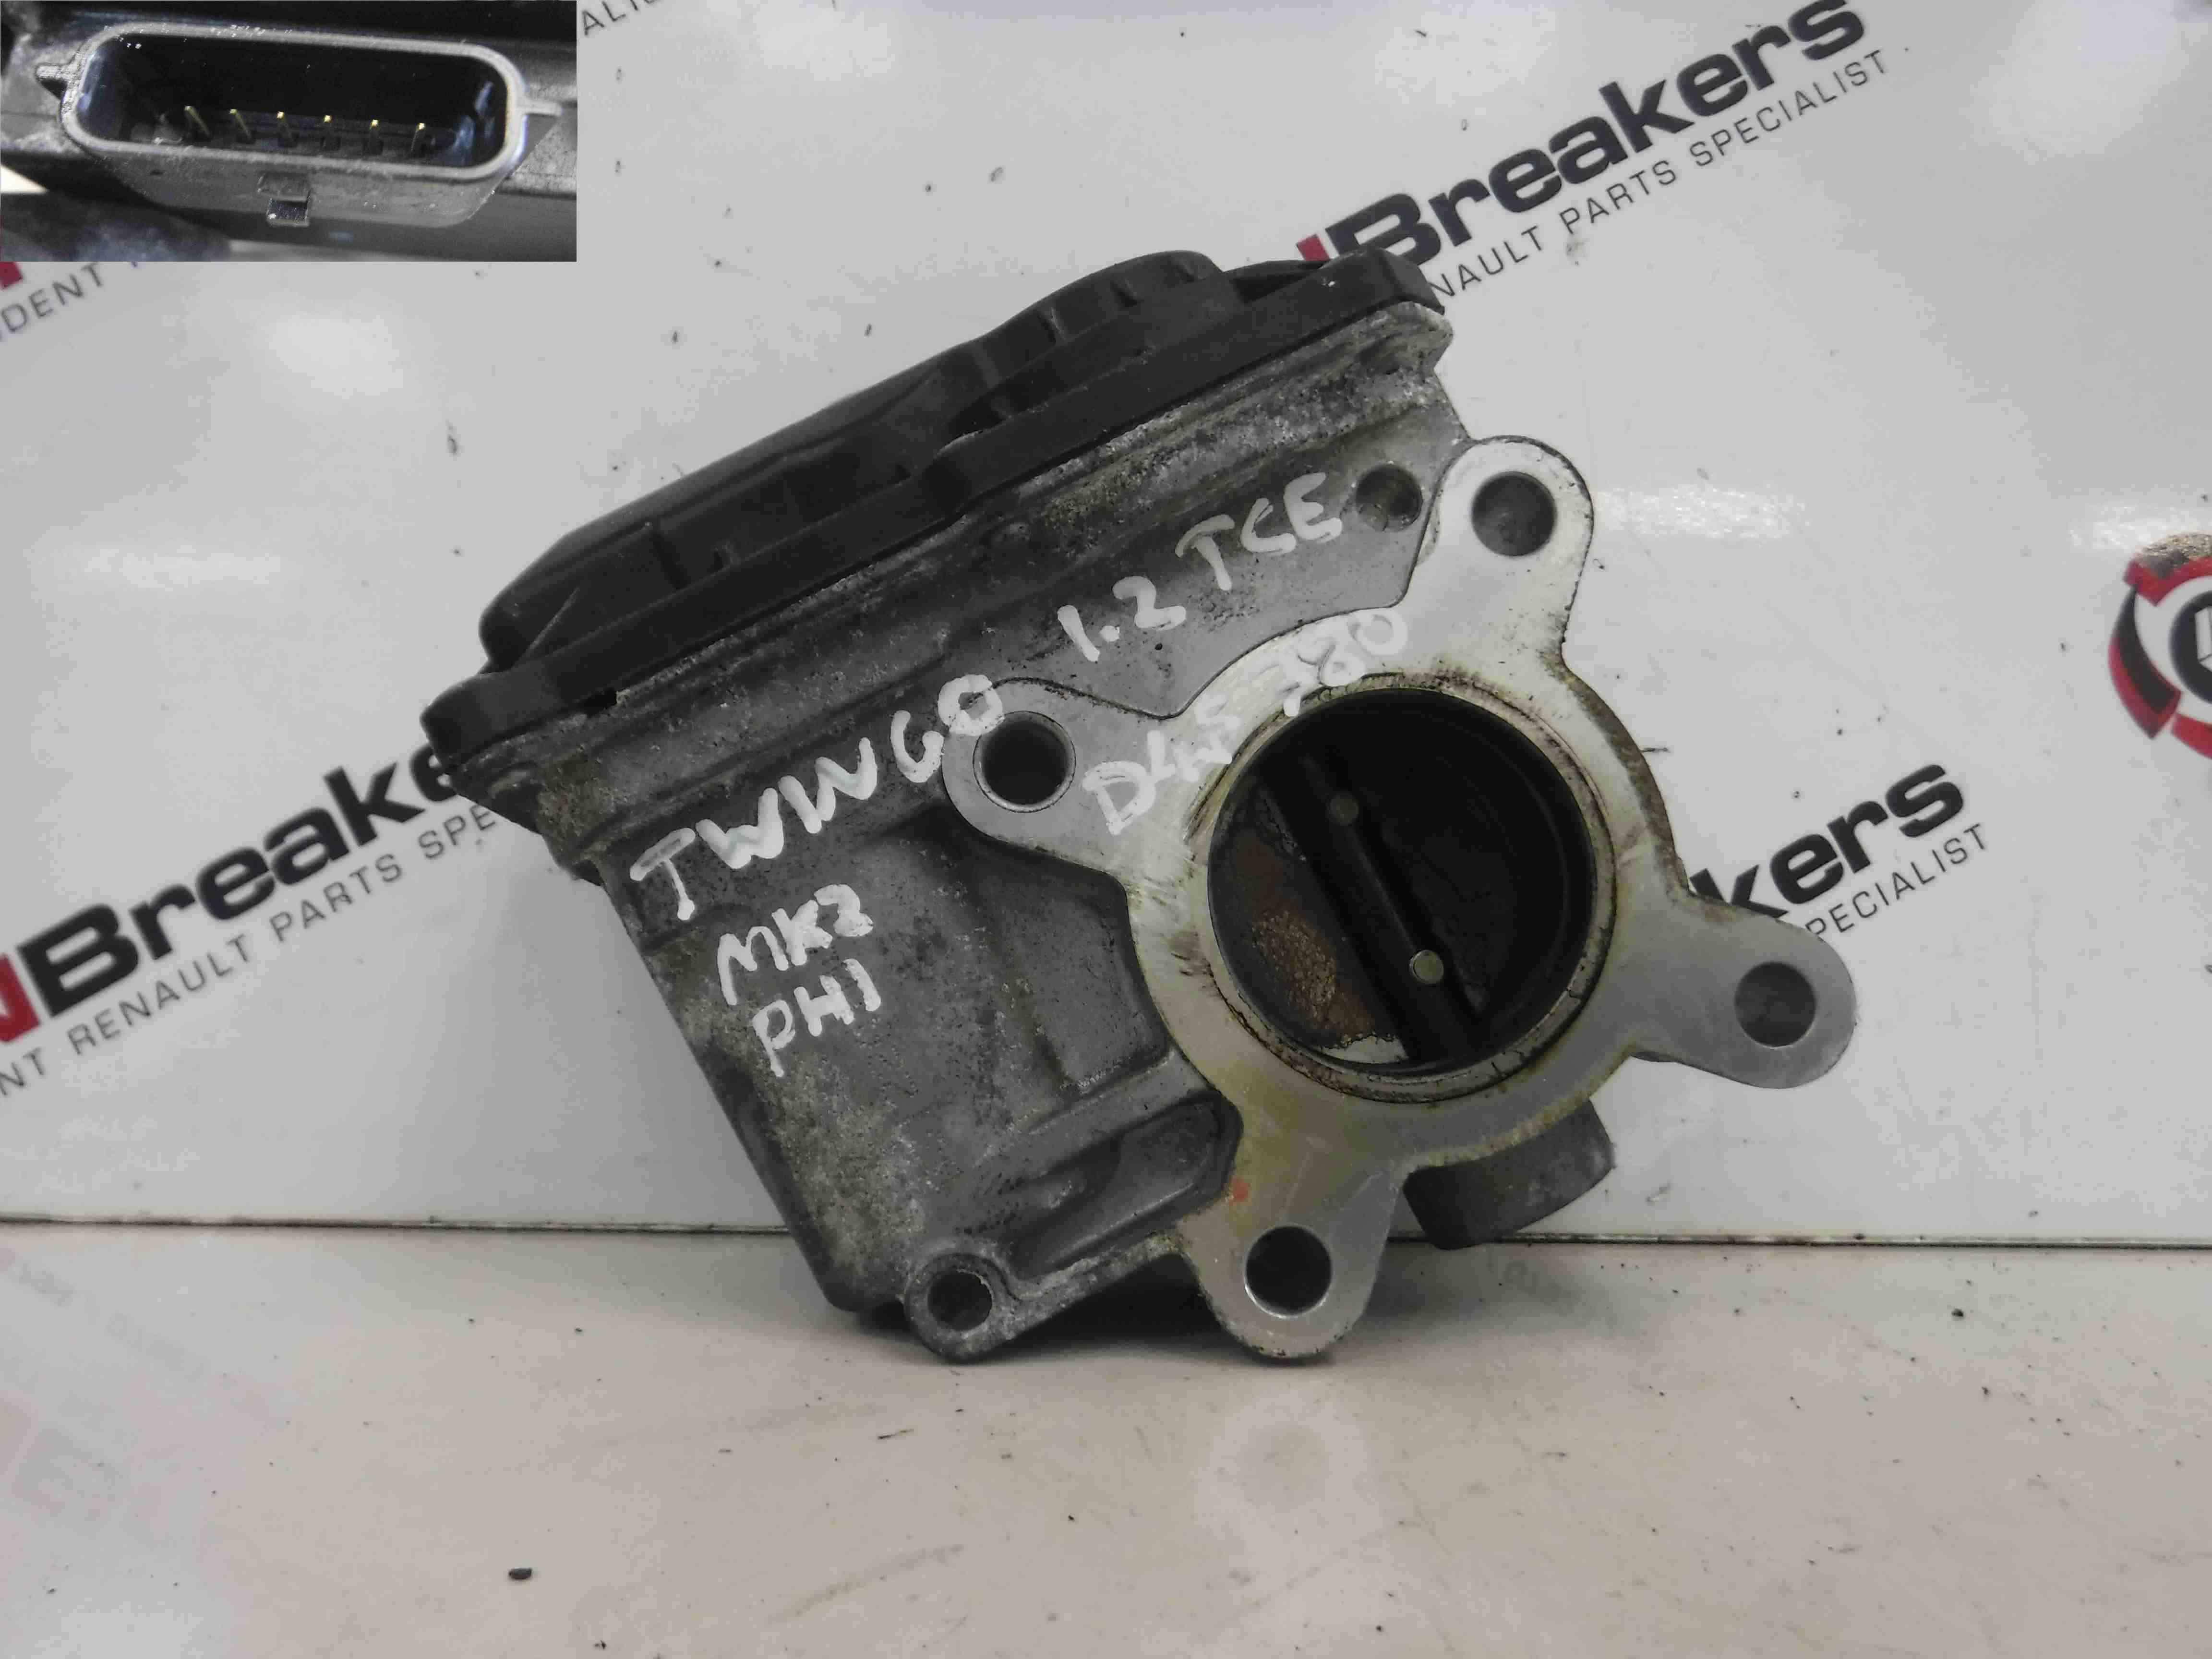 Renault Modus 2008-2012 + Wind 1.2 16v Turbo TCE Throttle Body 8200570865